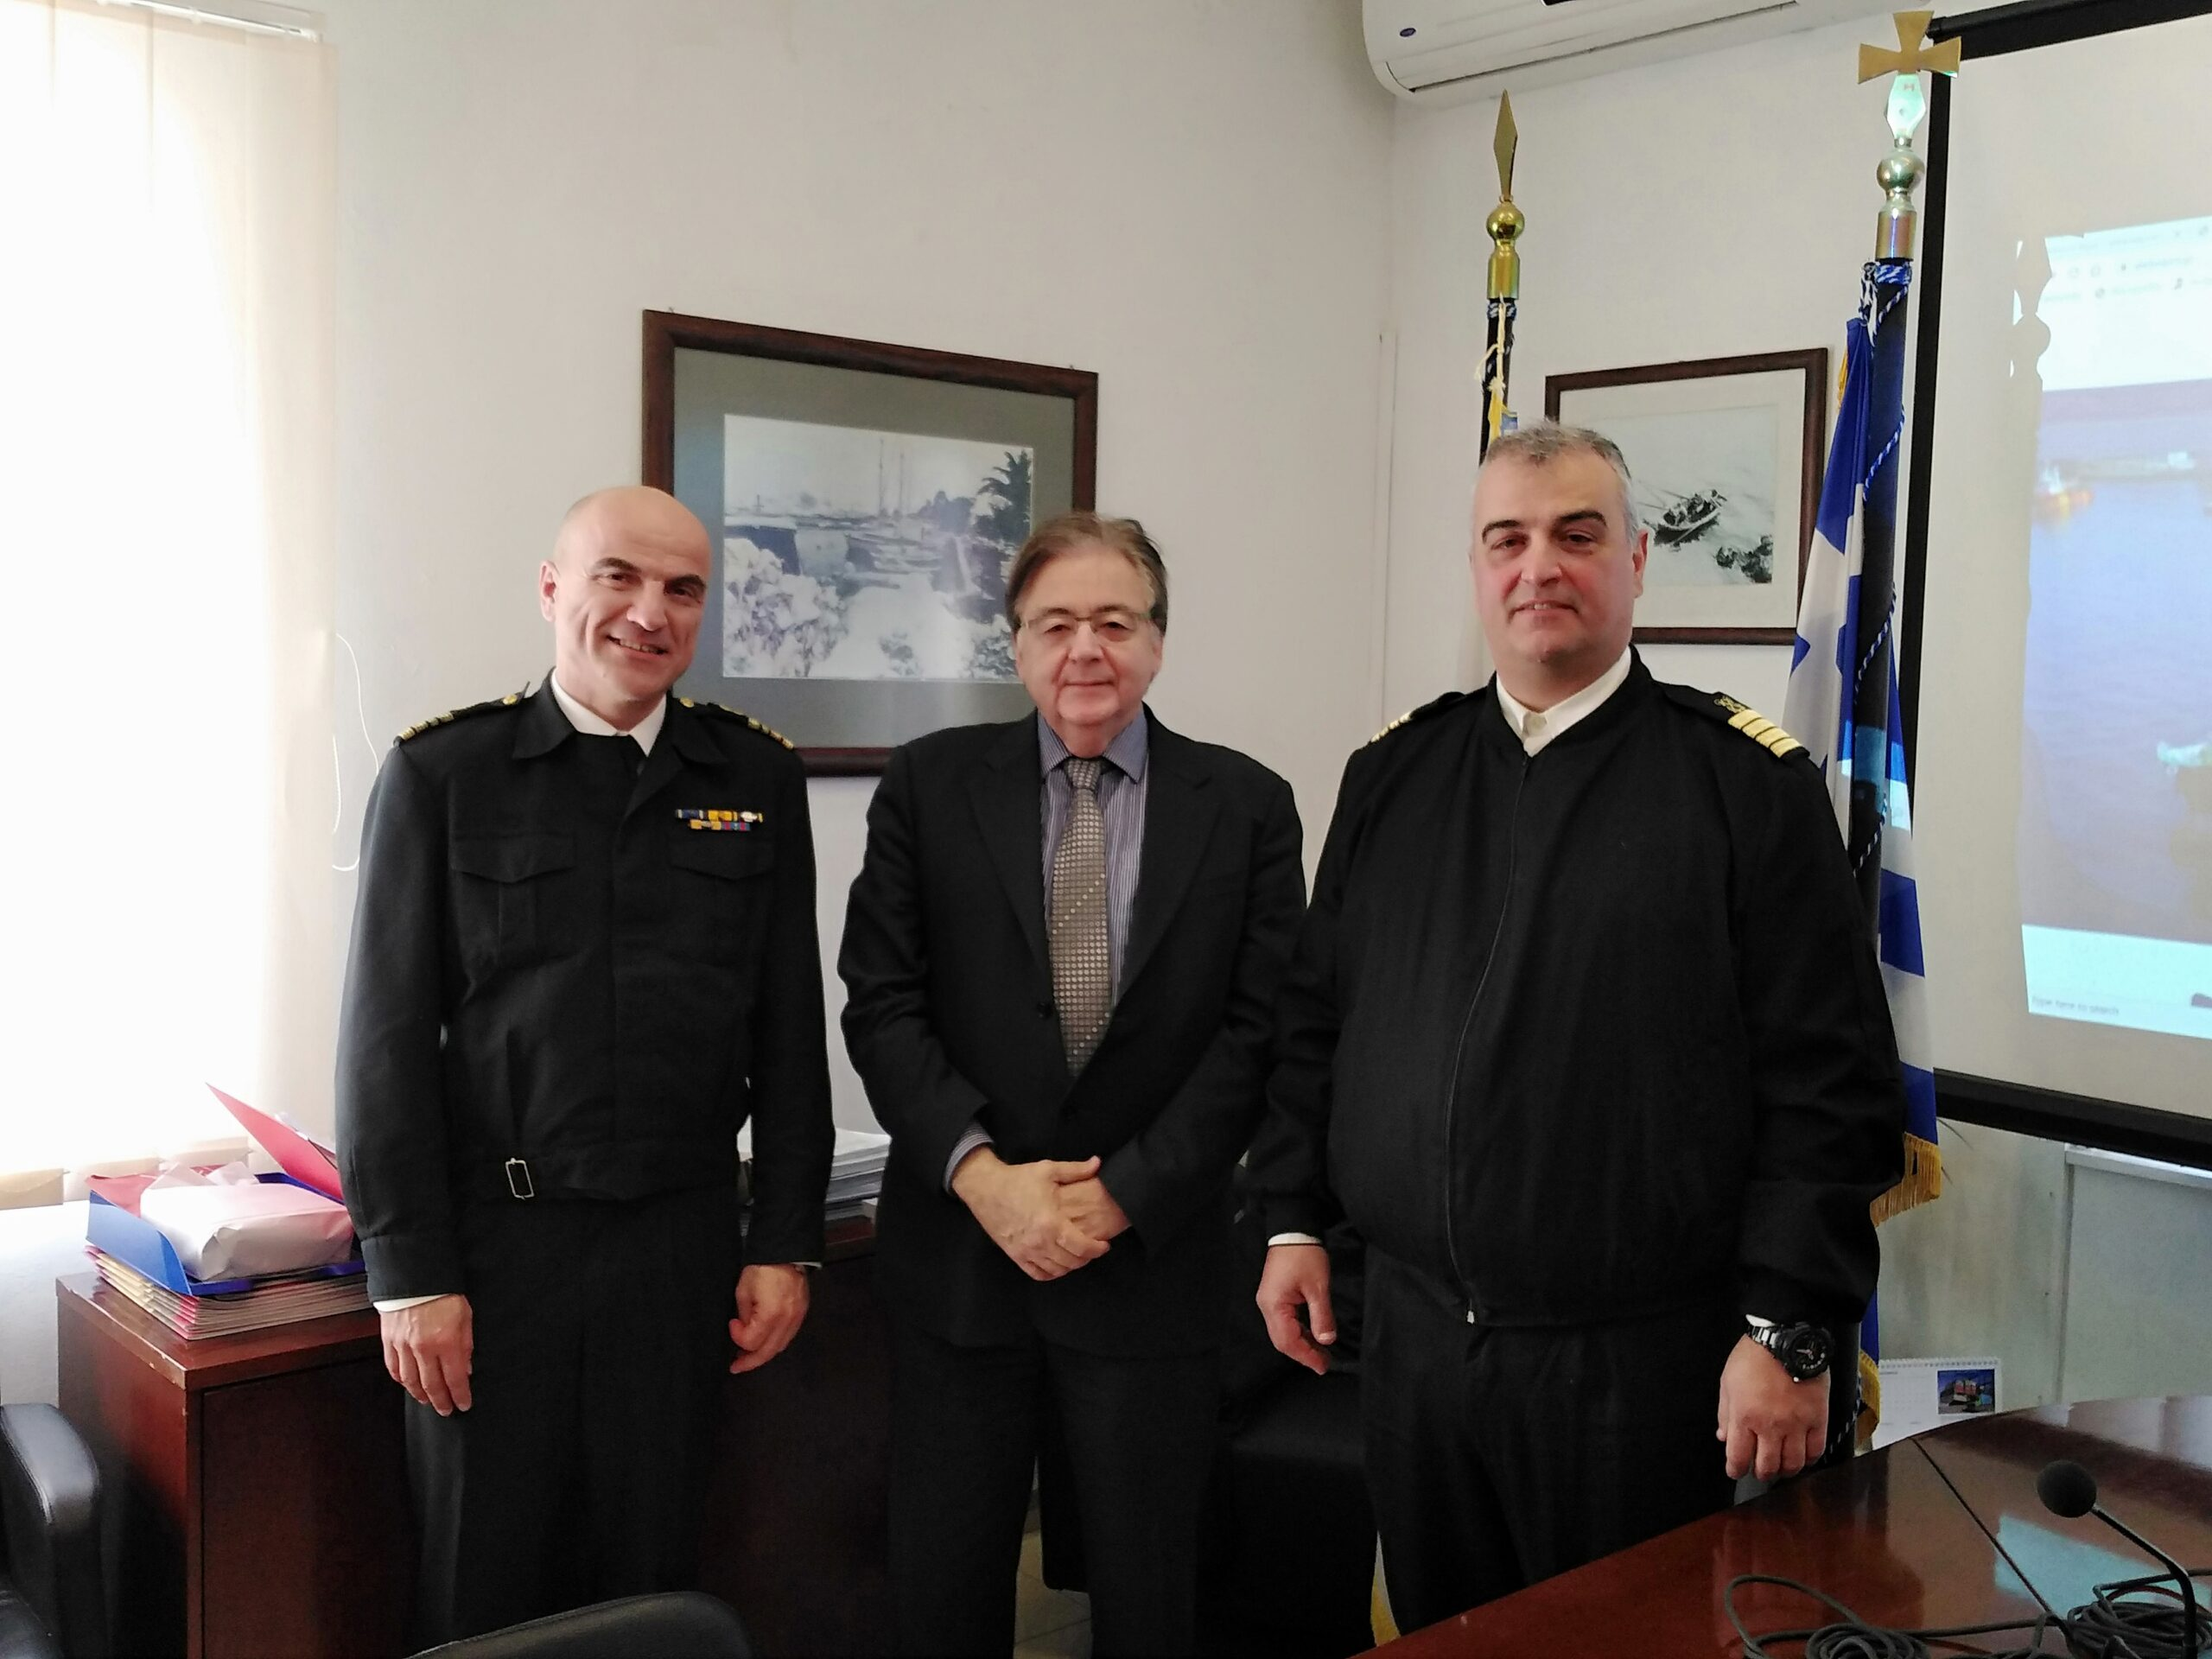 You are currently viewing Εθιμοτυπική επίσκεψη του νέου Λιμενάρχη Ελευσίνας στον Ο.Λ.Ε. ΑΕ